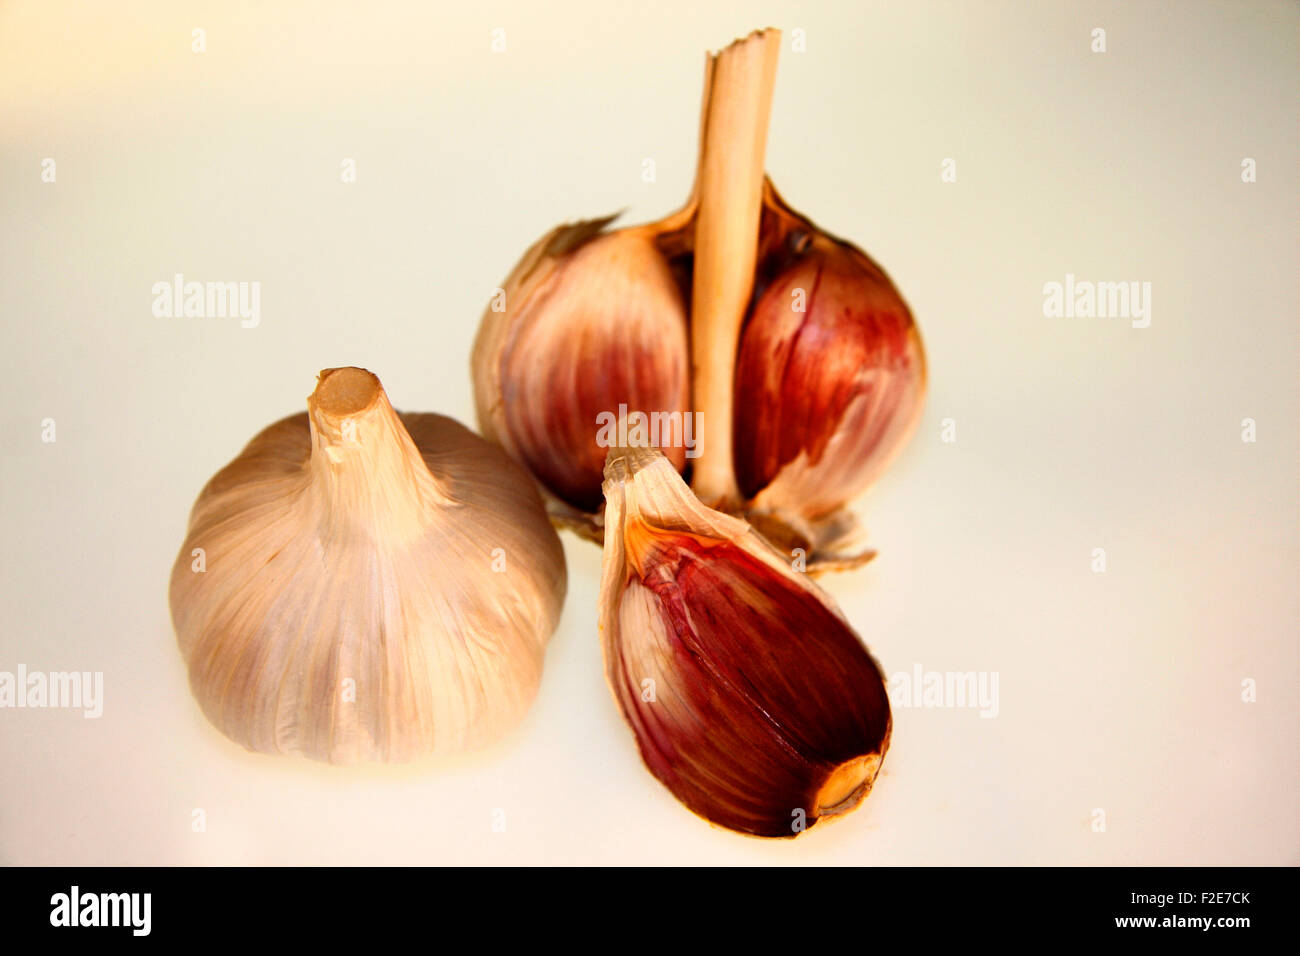 Knoblauch - Symbolbild Nahrungsmittel . Stock Photo